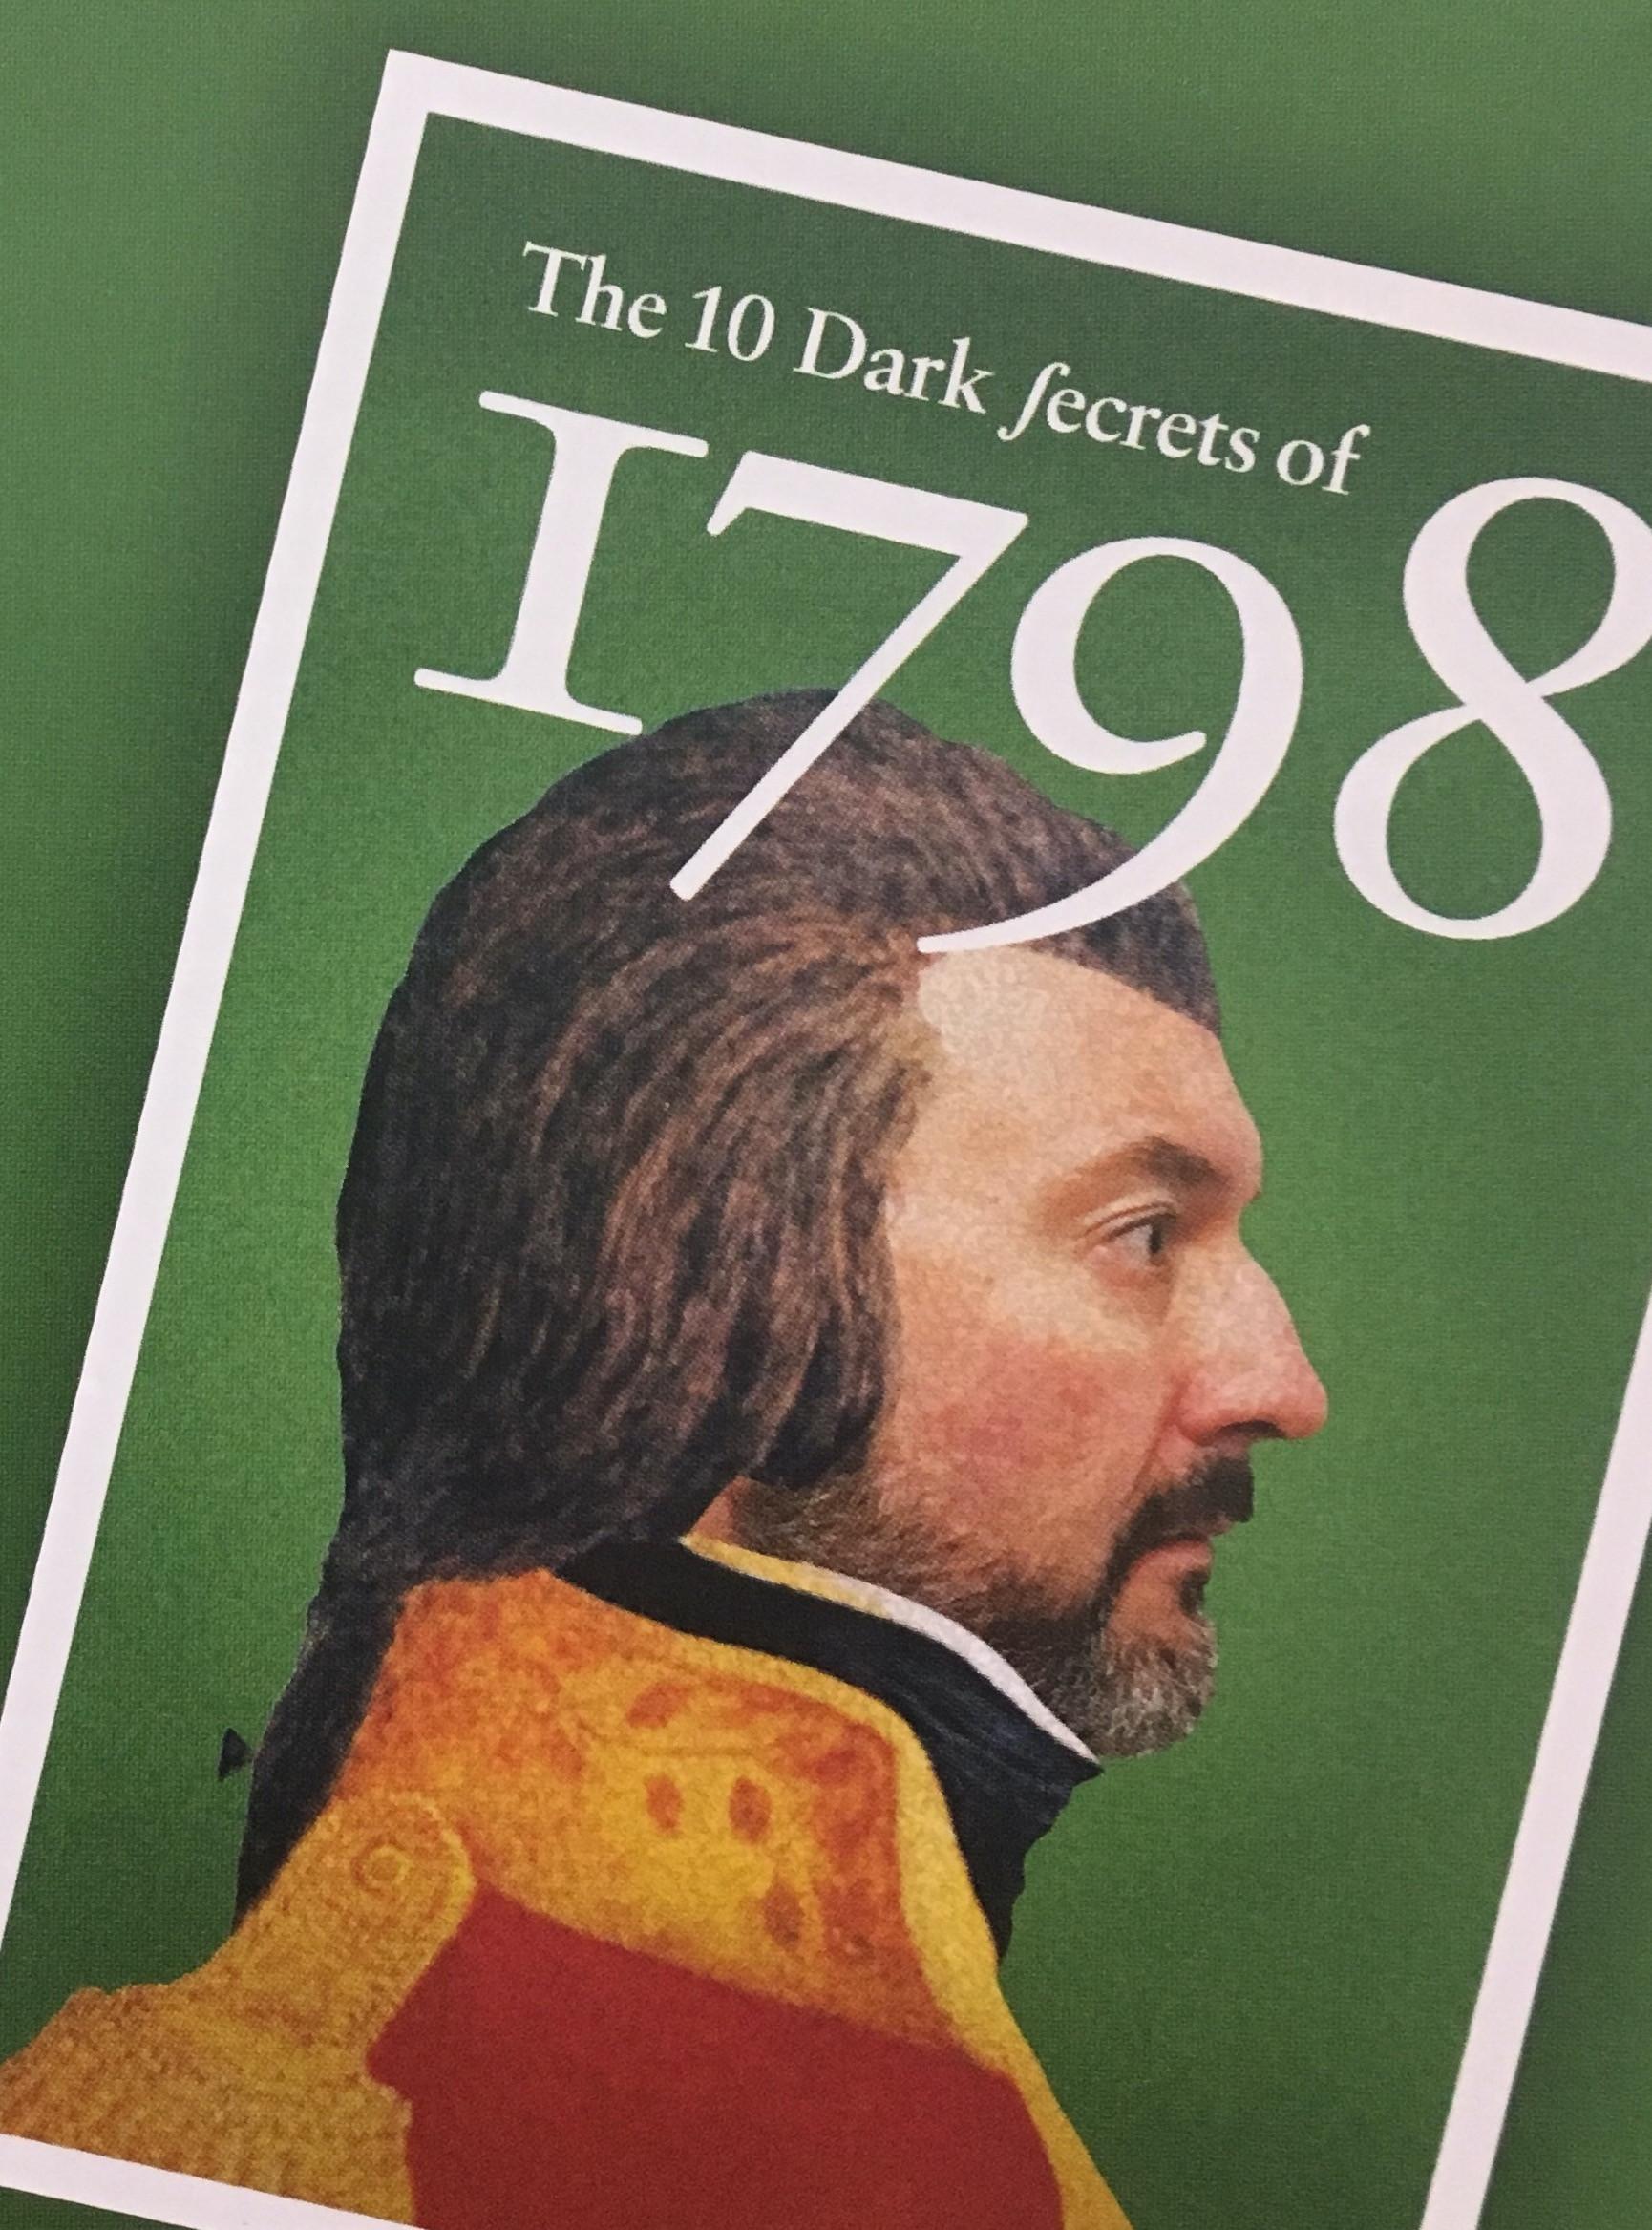 10 Dark Secrets of 1798